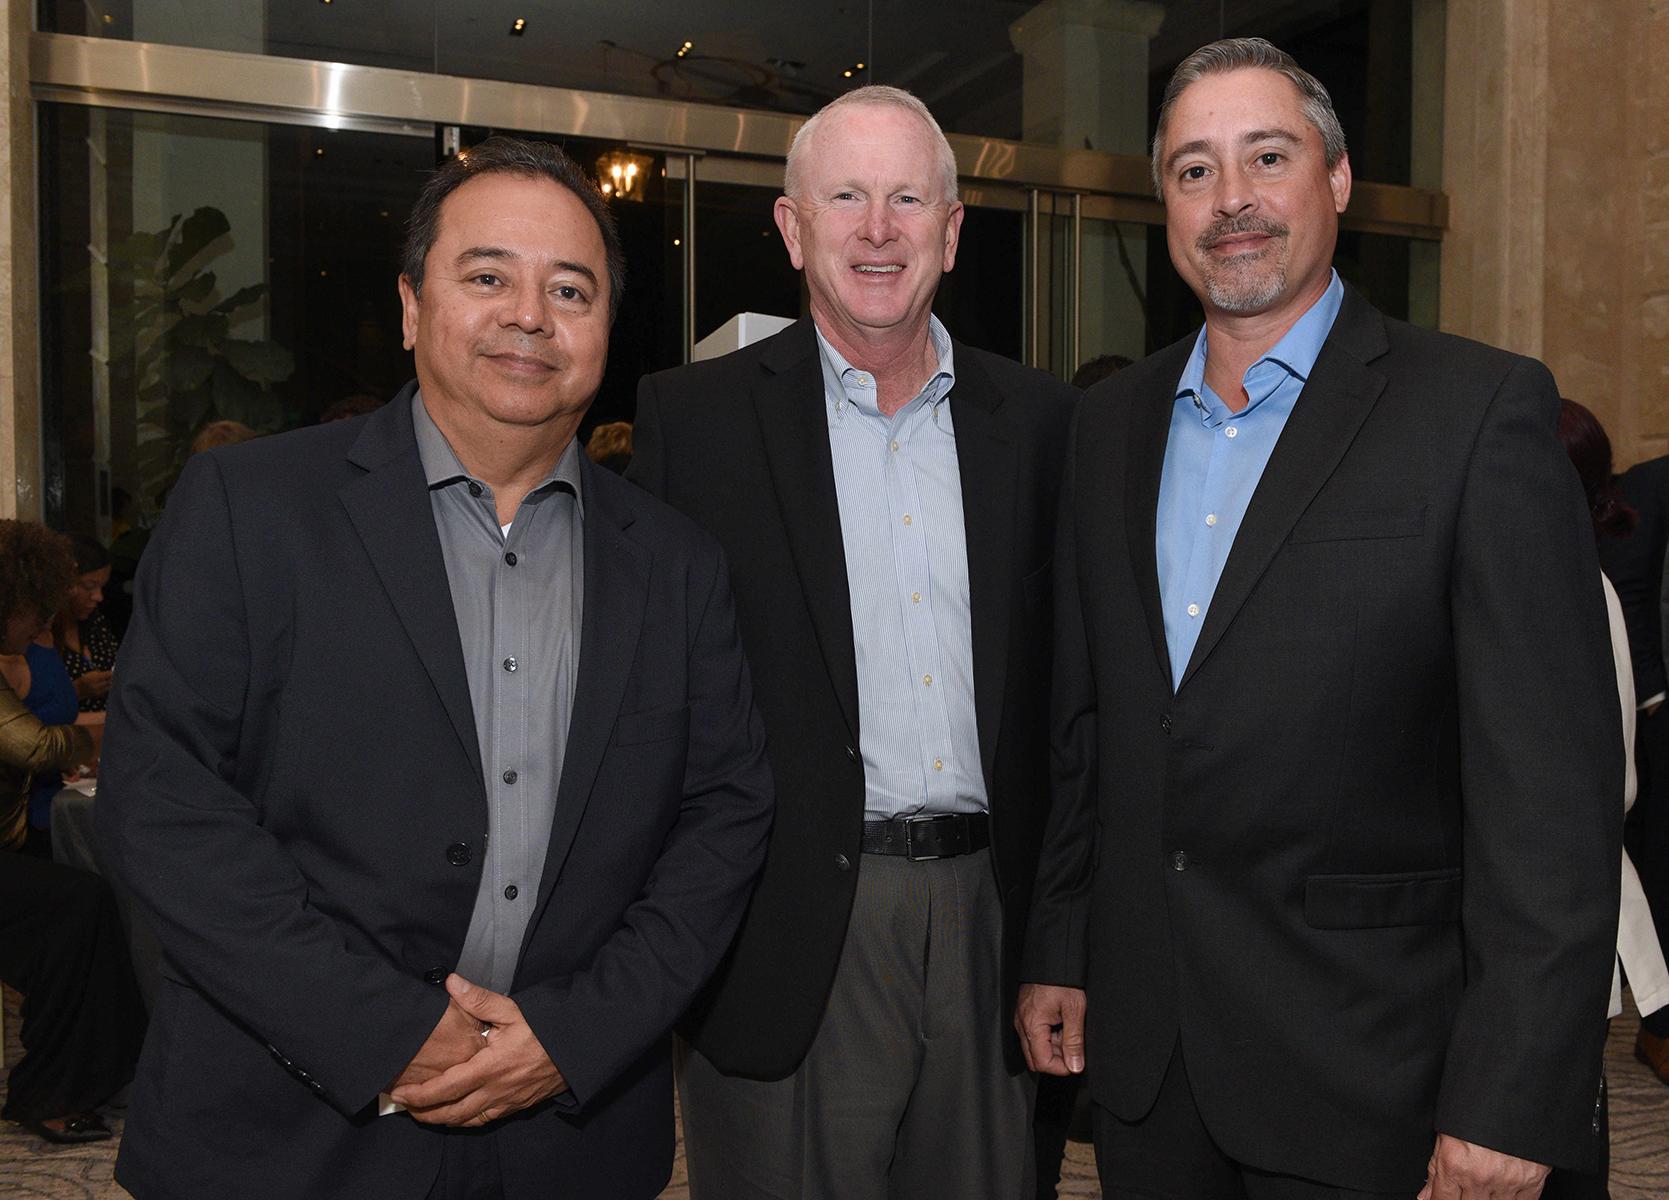 Marcelo Zamora, Tom Tighe y Ernesto Rivera. (Fotos: Ingrid Torres)